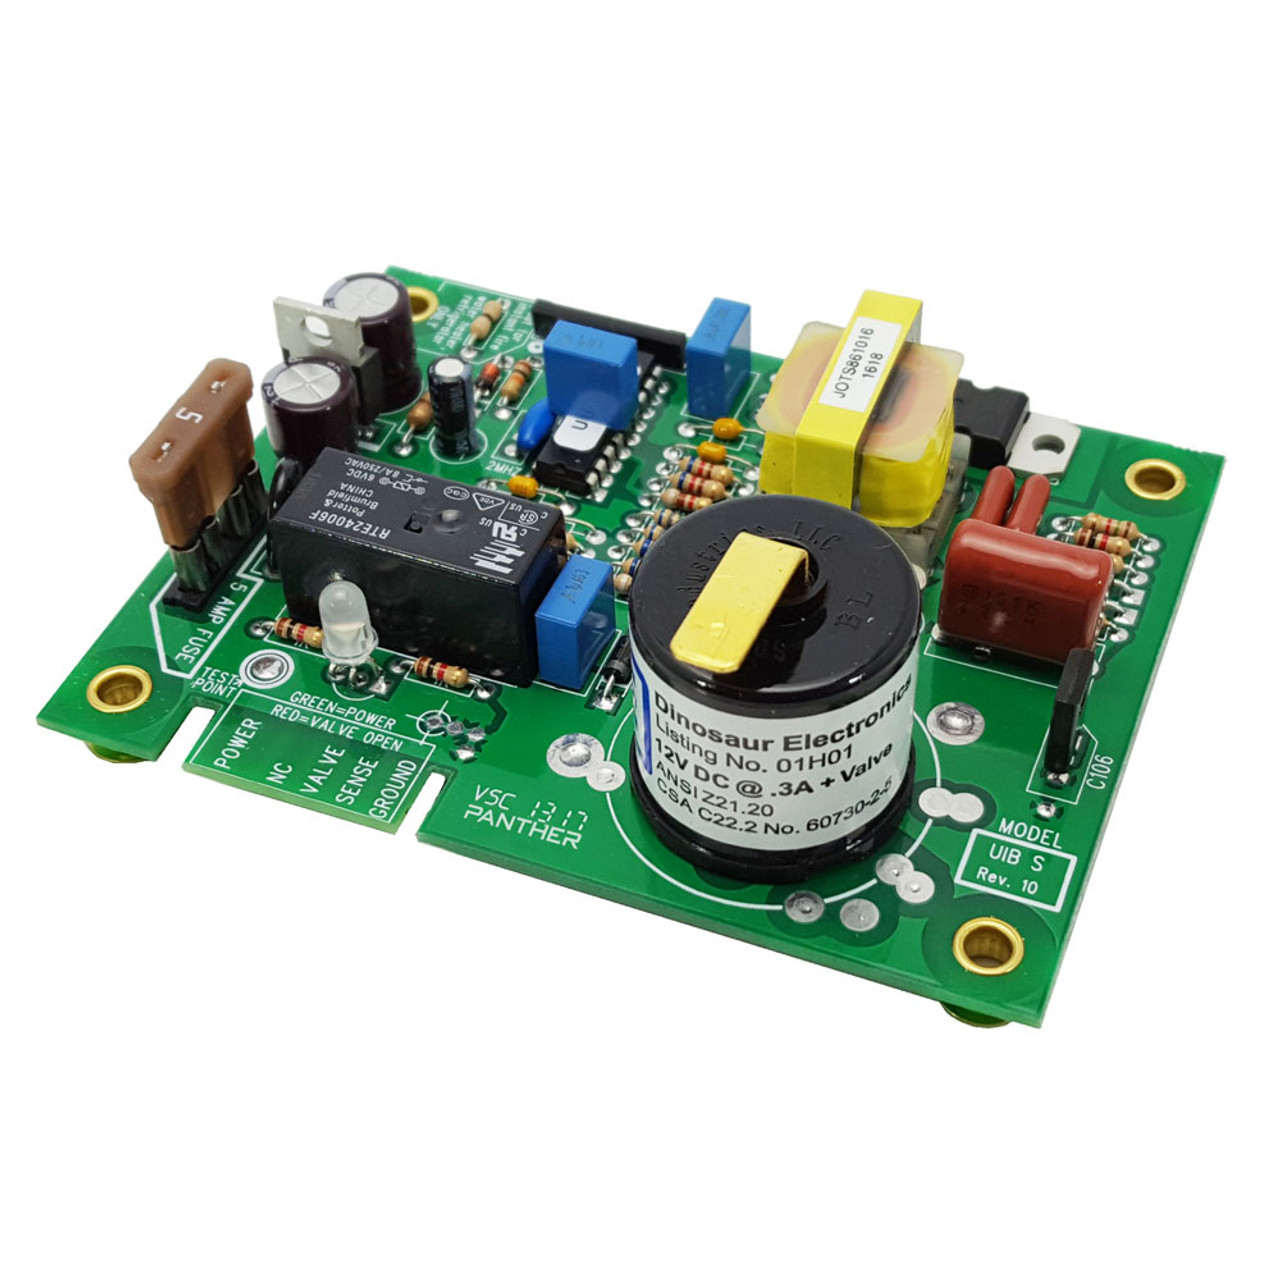 dinosaur elect uib s universal ignitor control board small atwood 93865 circuit board wiring diagram [ 1280 x 1280 Pixel ]